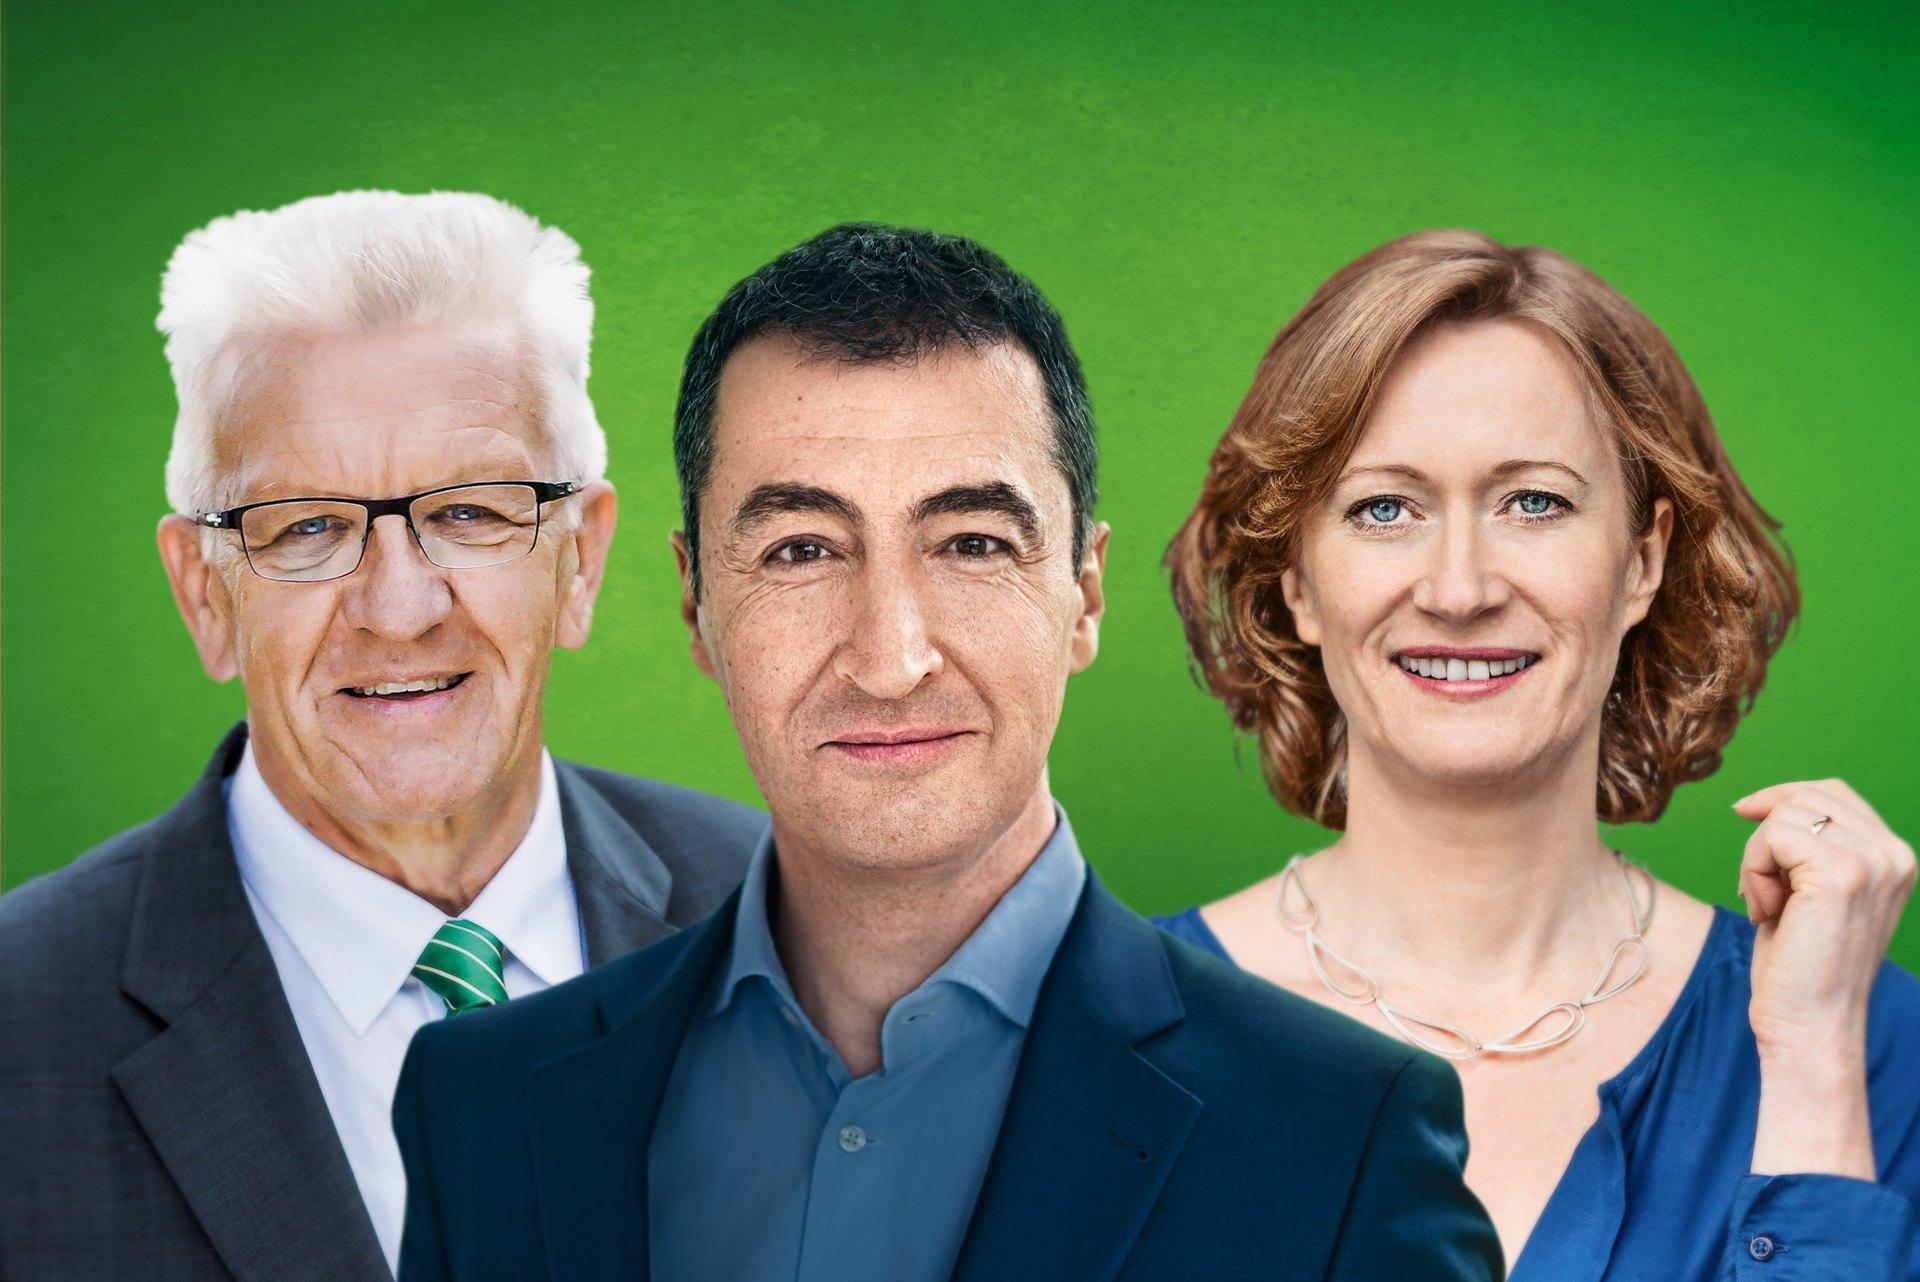 Grünen Wahlkampfhöhepunkt Mit Cem –zdemir Winfried Kretschmann Und